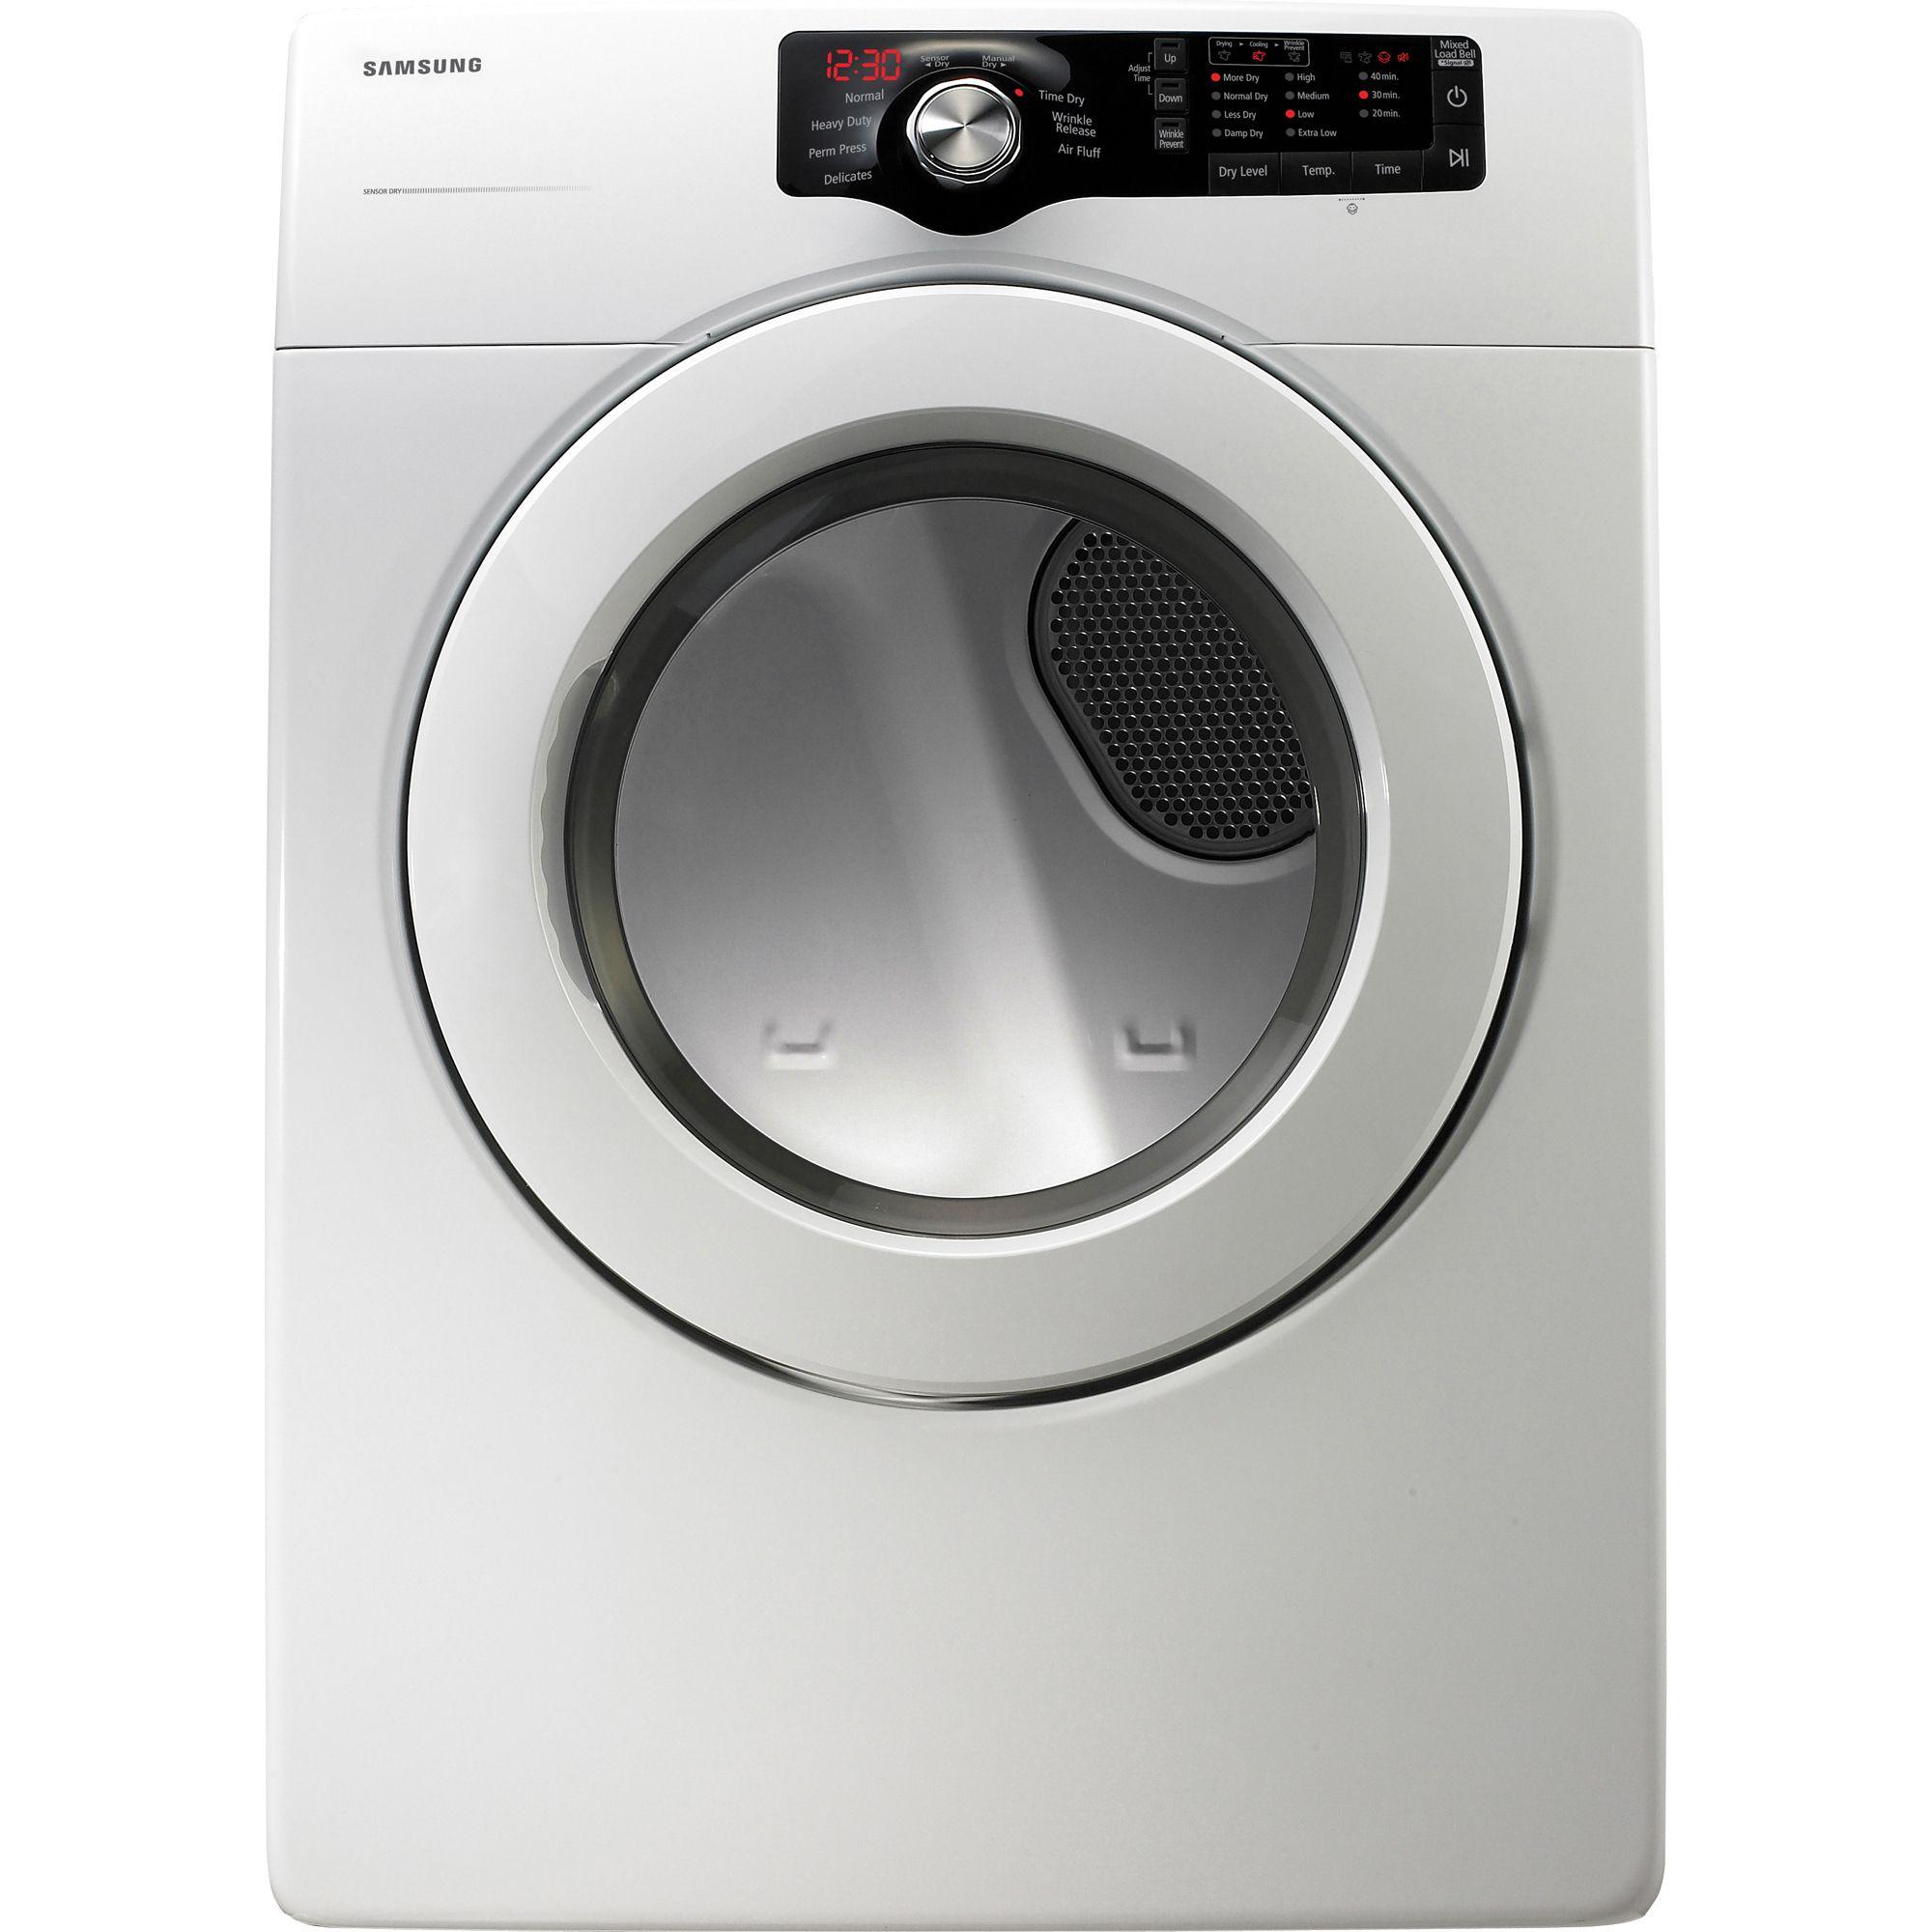 Samsung Dryer Parts Model Dv231agwxaa0001 Sears Partsdirect